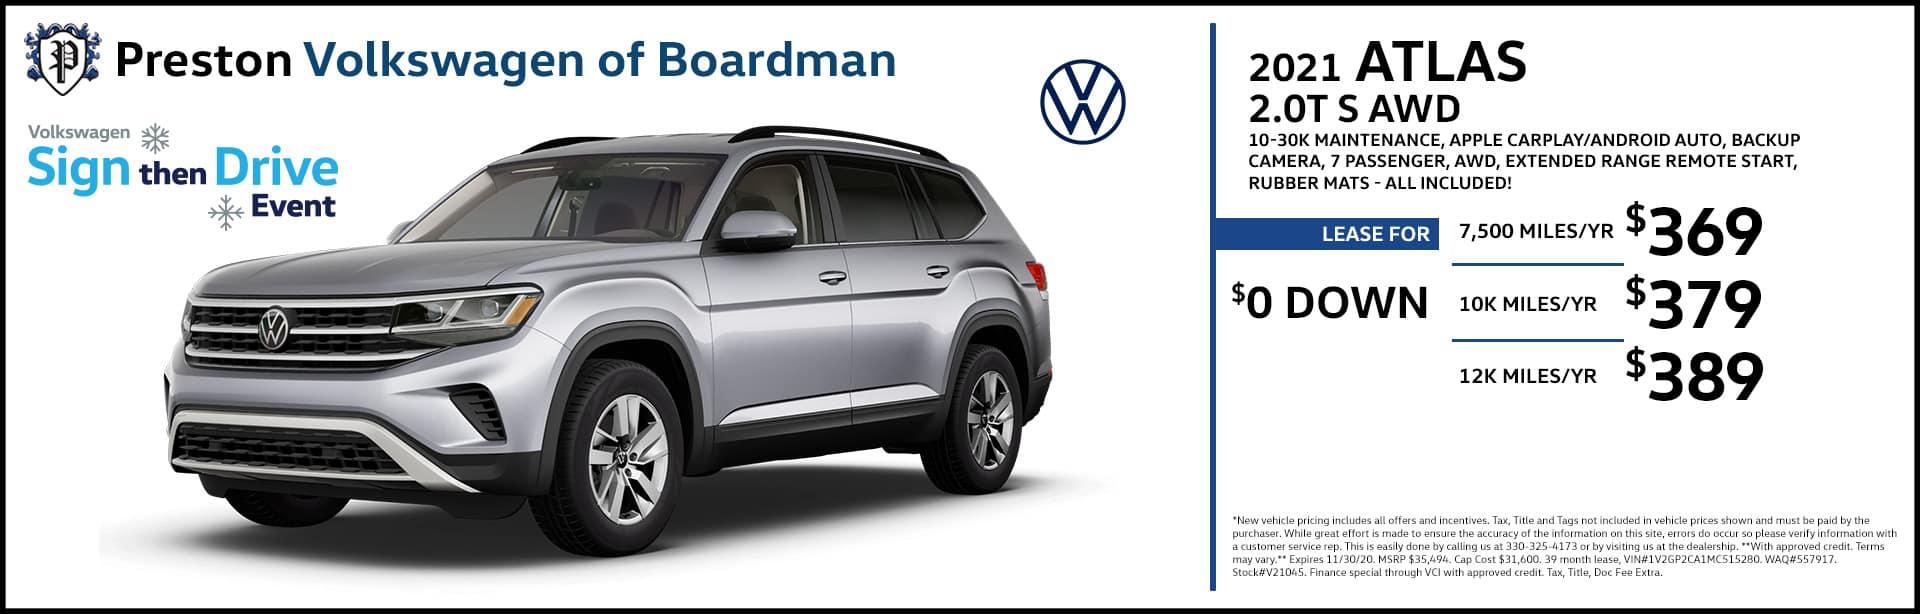 November special on the 2021 Volkswagen Atlas